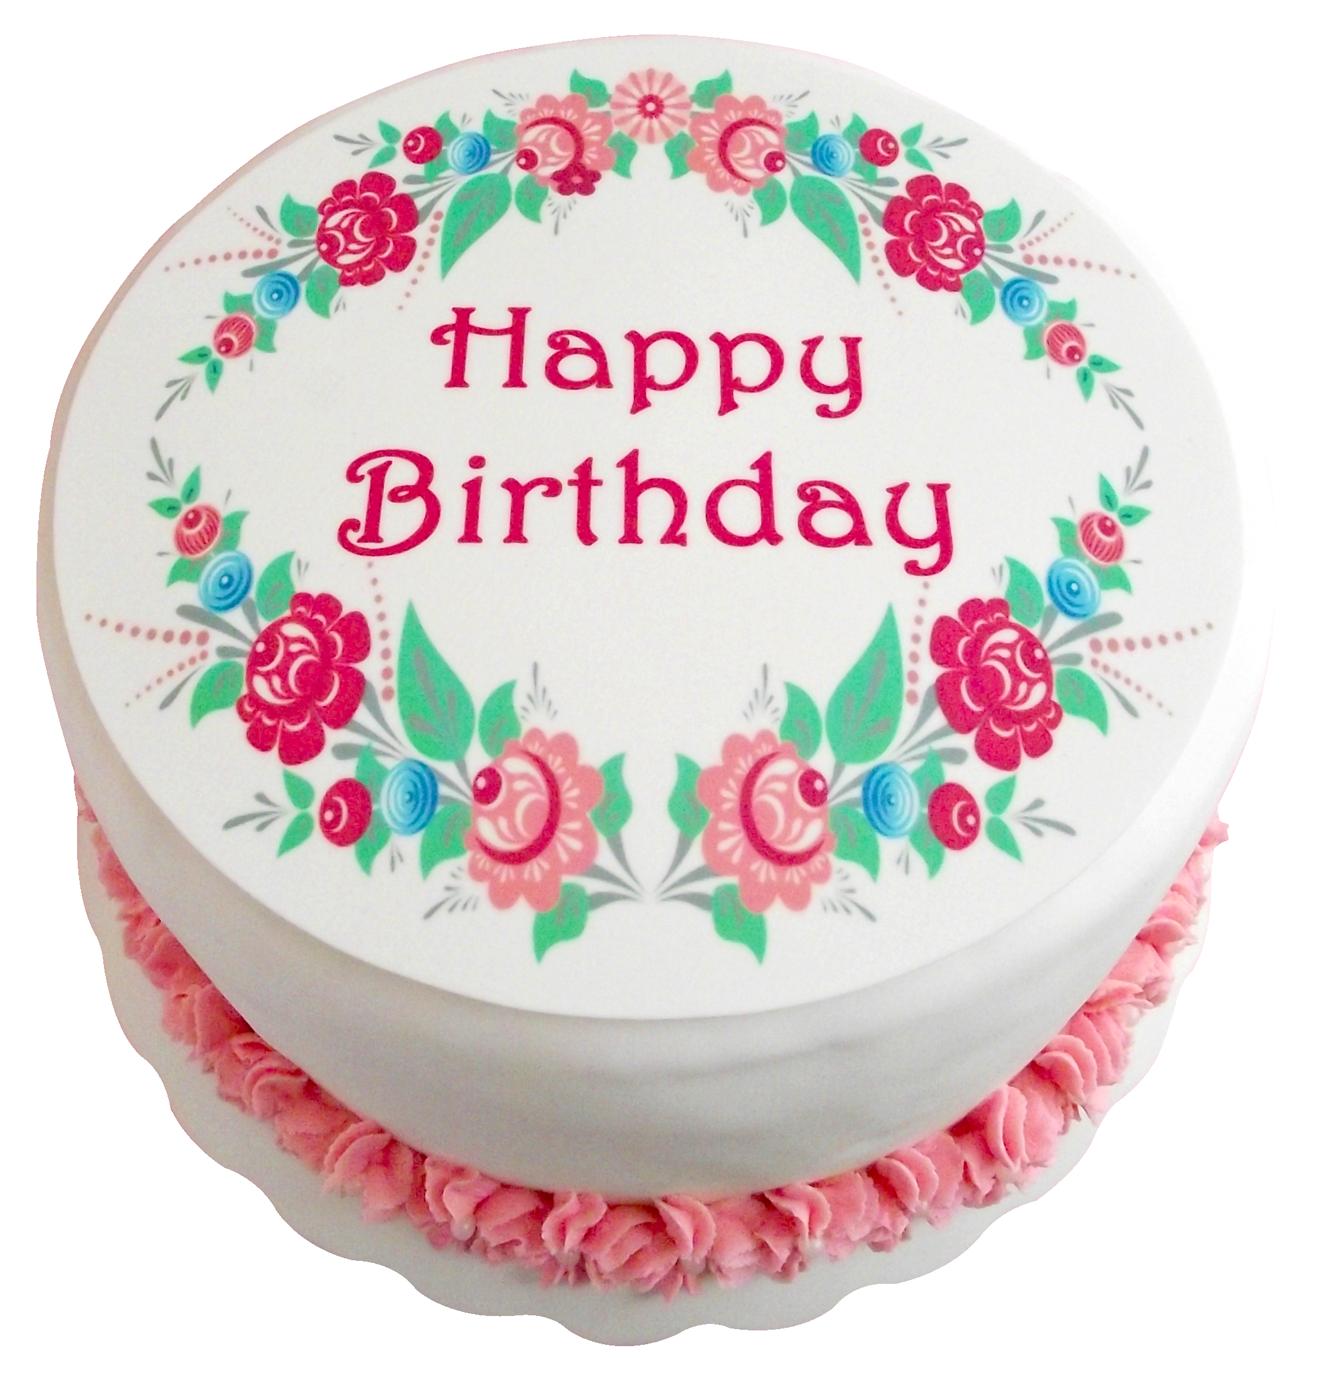 Birthday Cake PNG - 13805